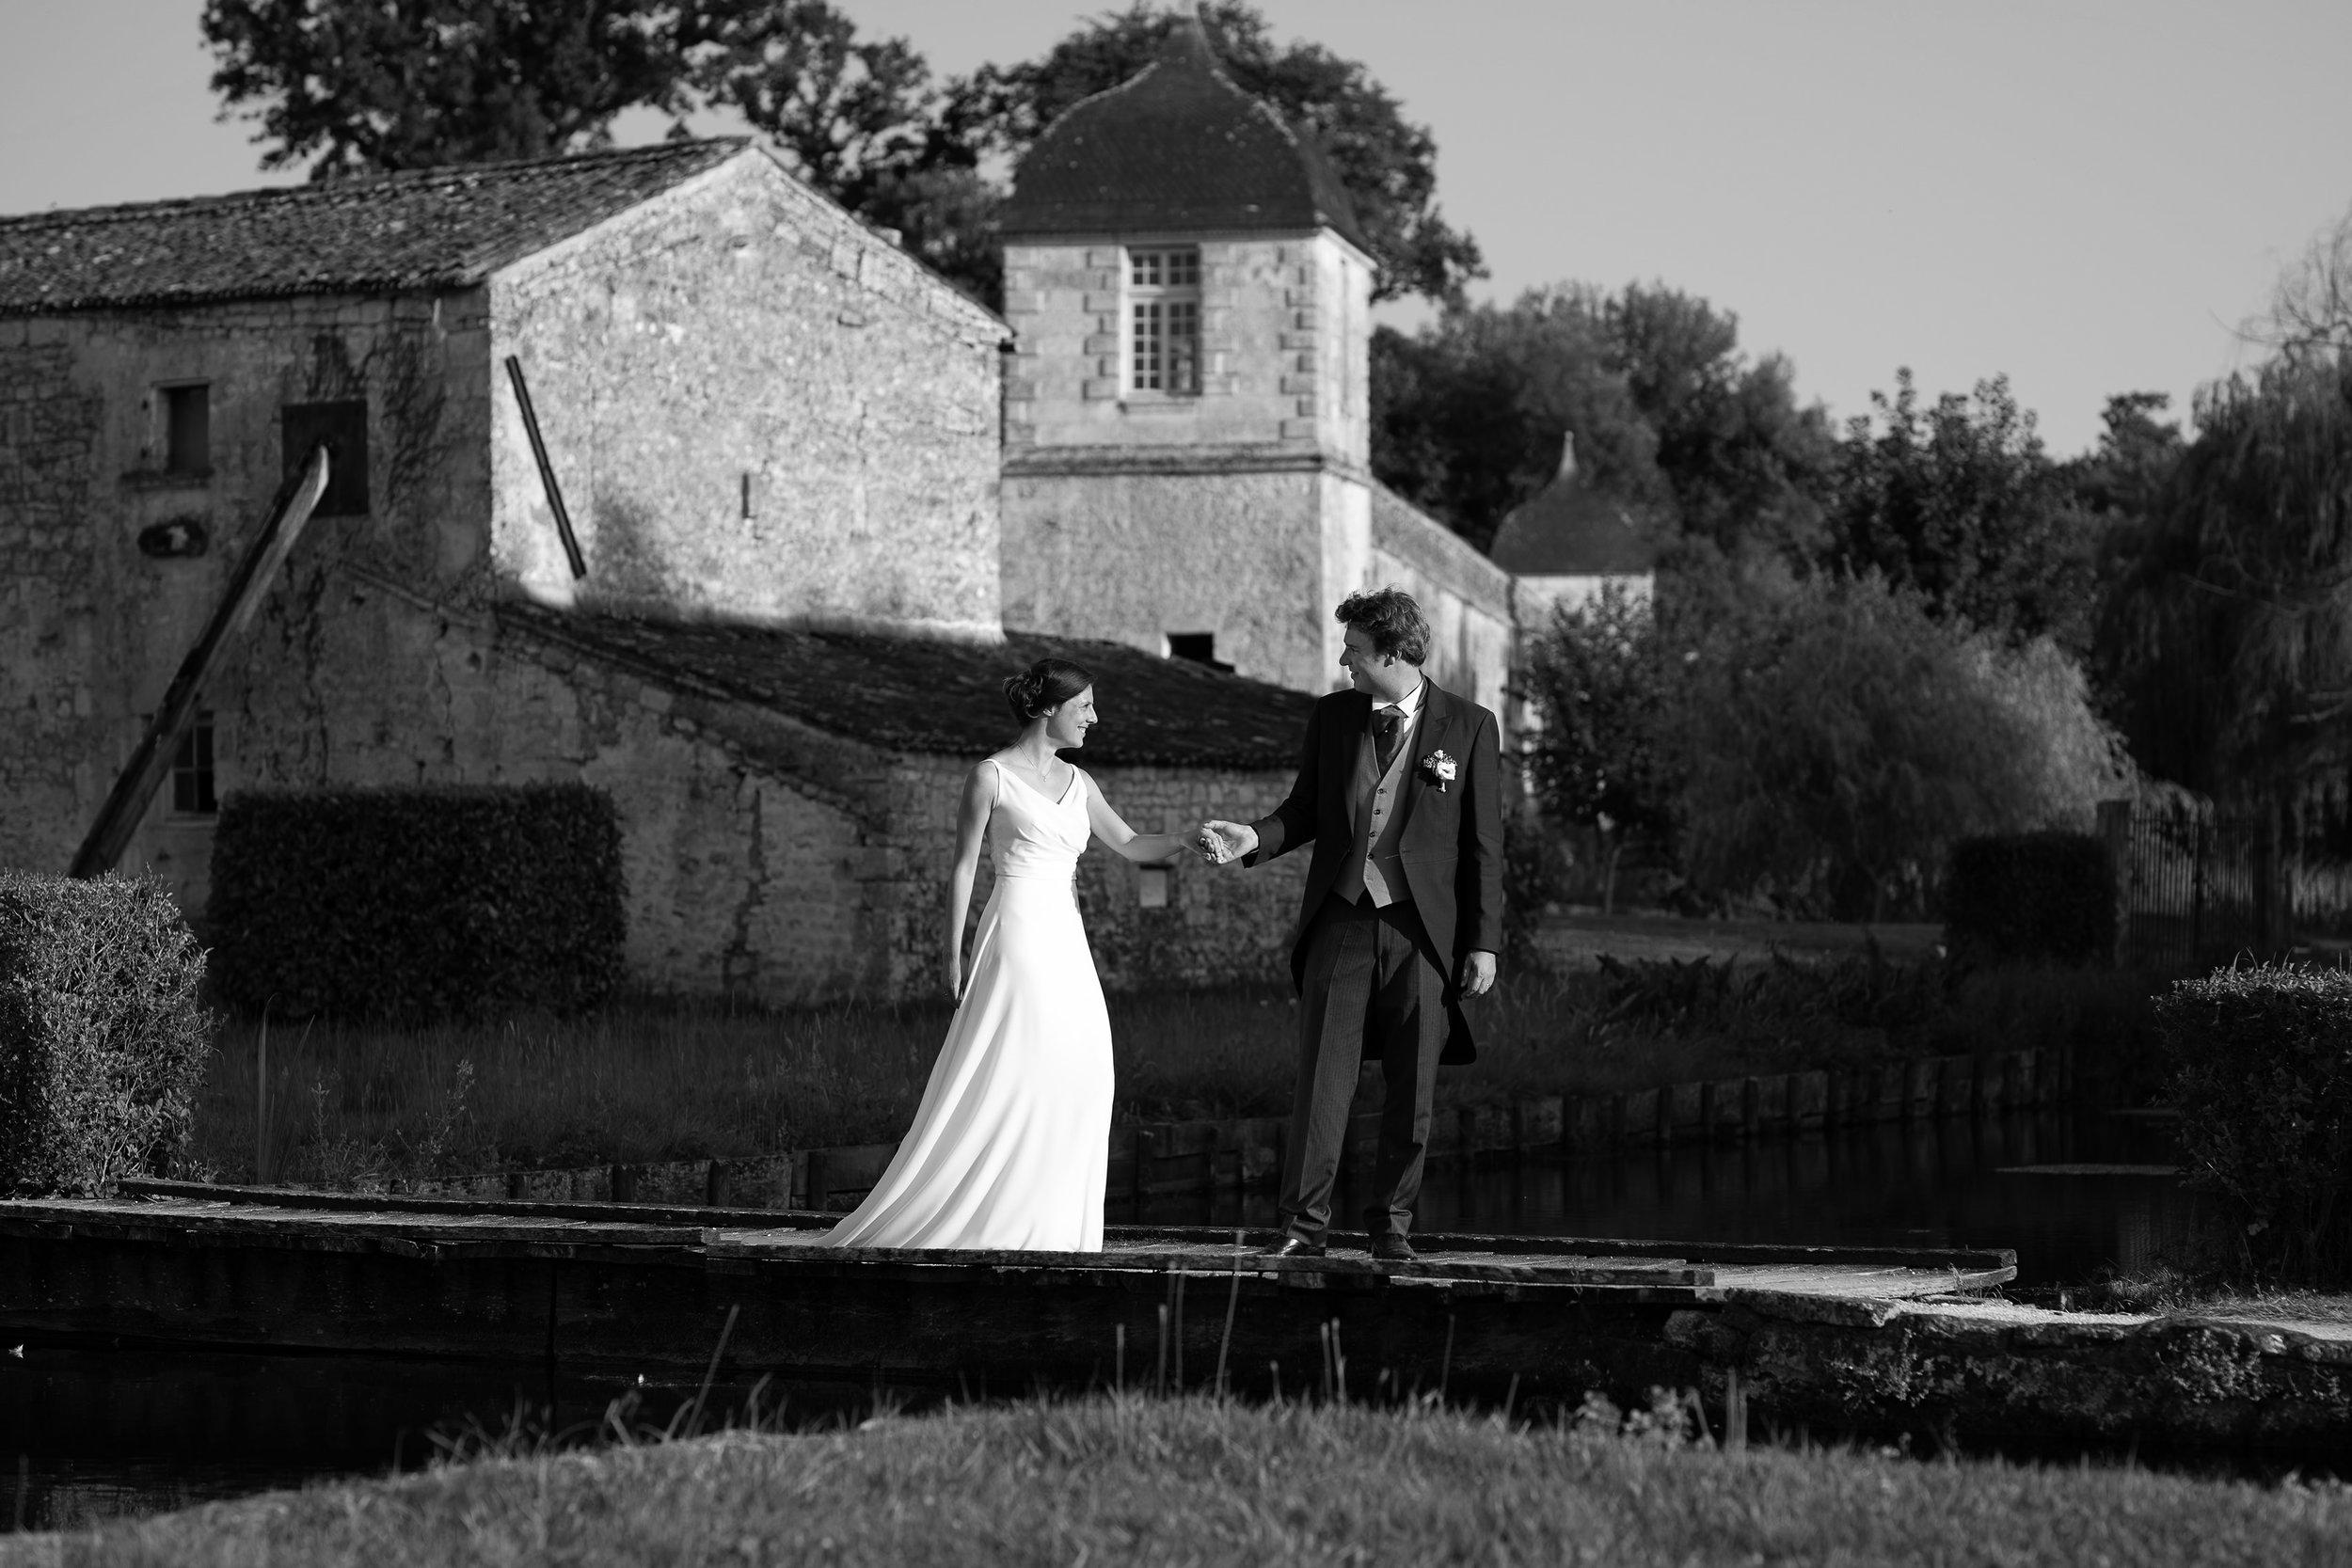 photographe-mariage-chateau-la-roche-courbon-341.jpg